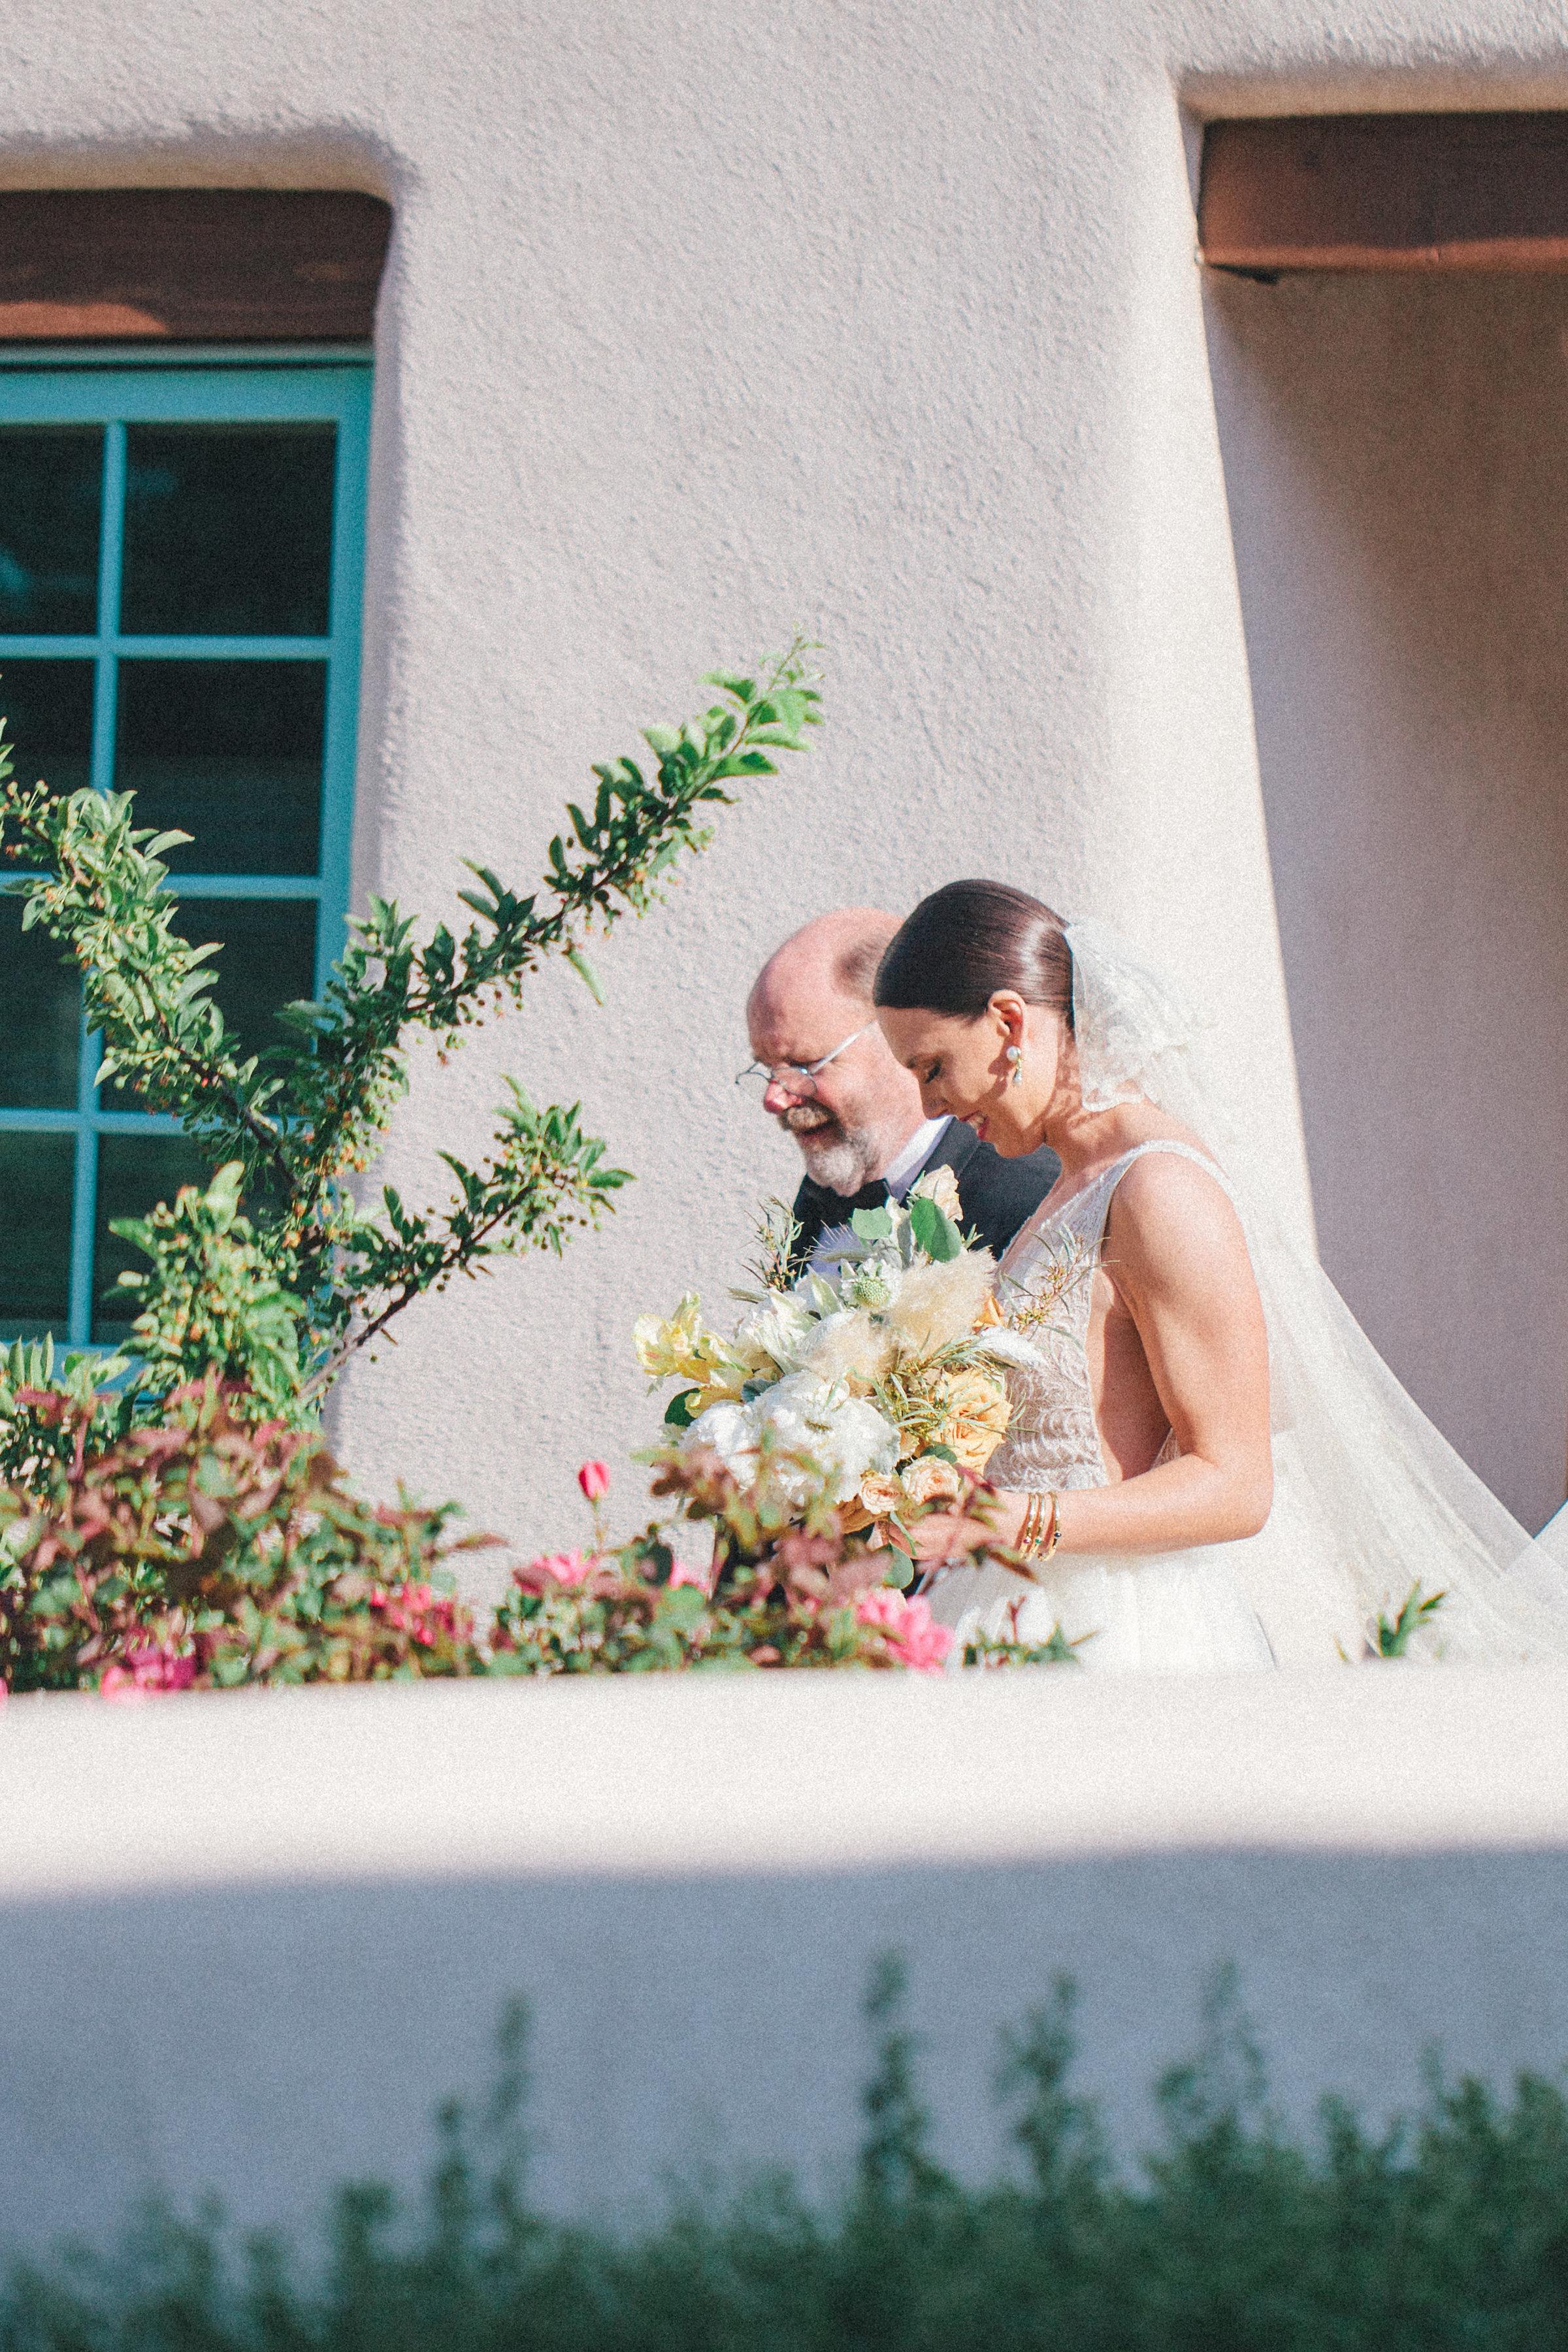 landry_lovelace_wedding_jbobephoto-369.jpg